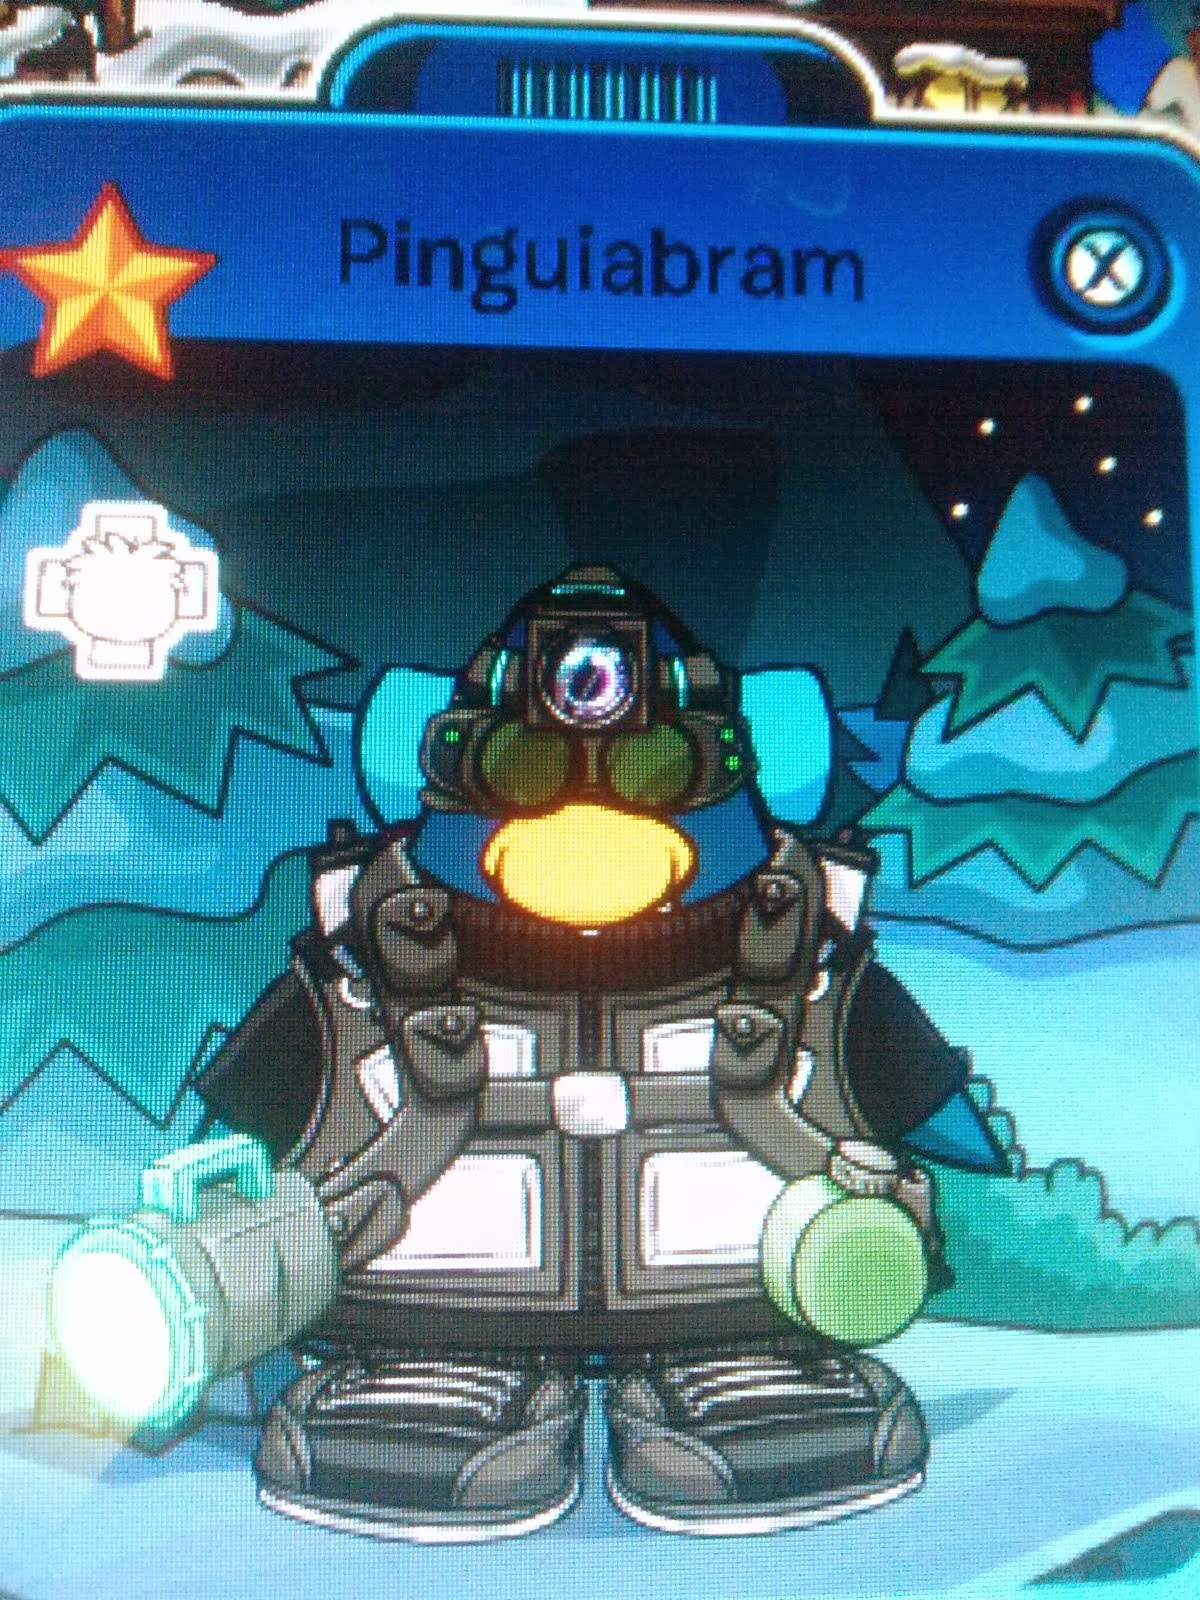 Pinguiabram